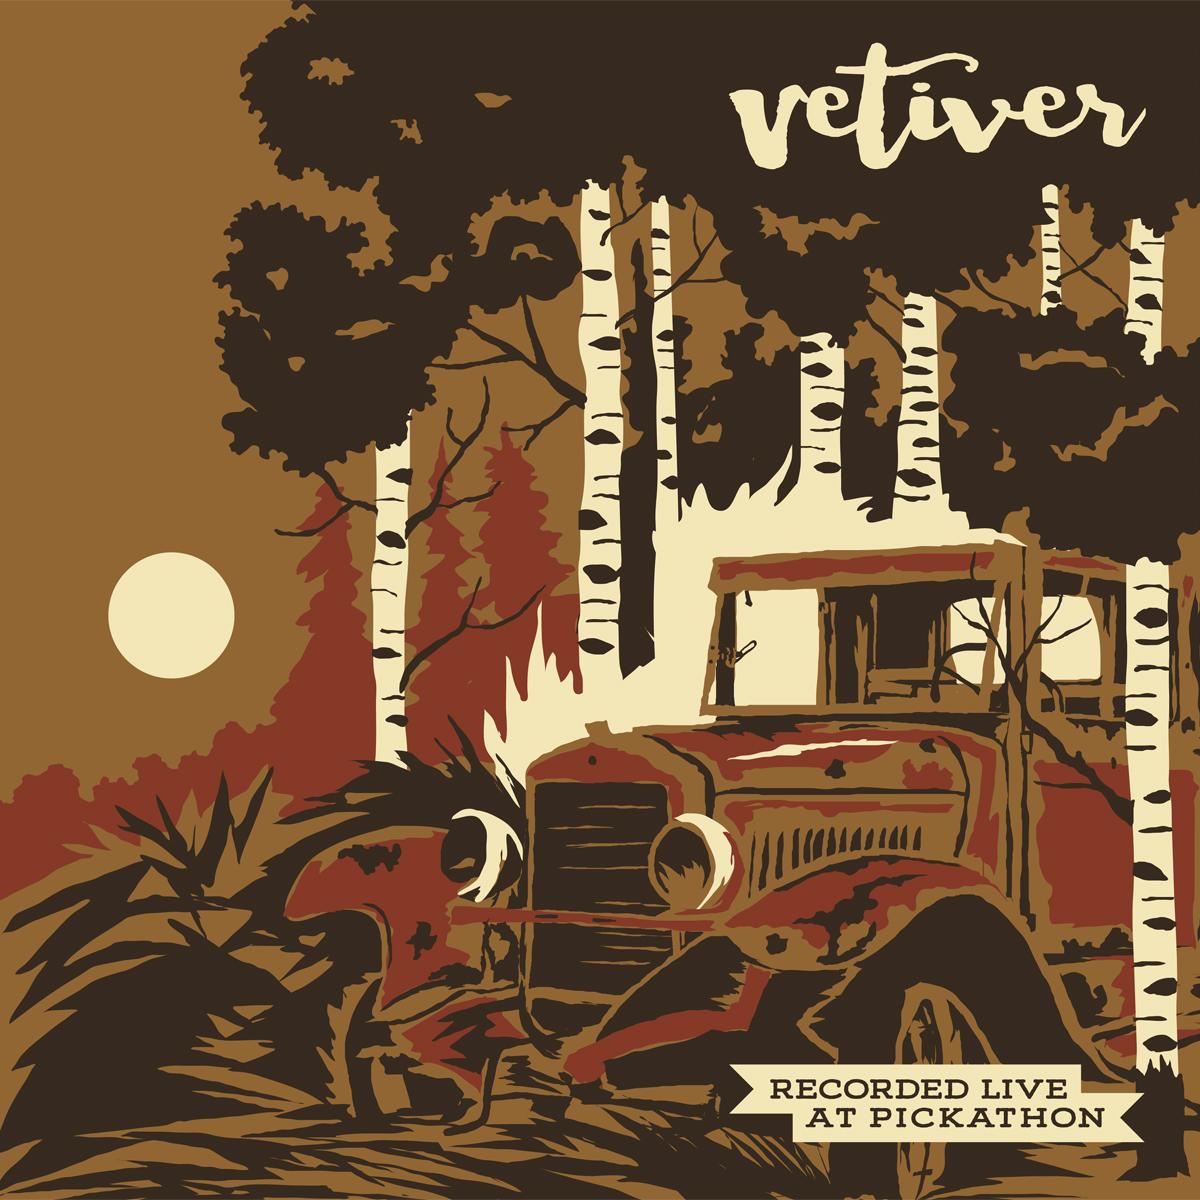 vetiver-jacketV2-1.jpg